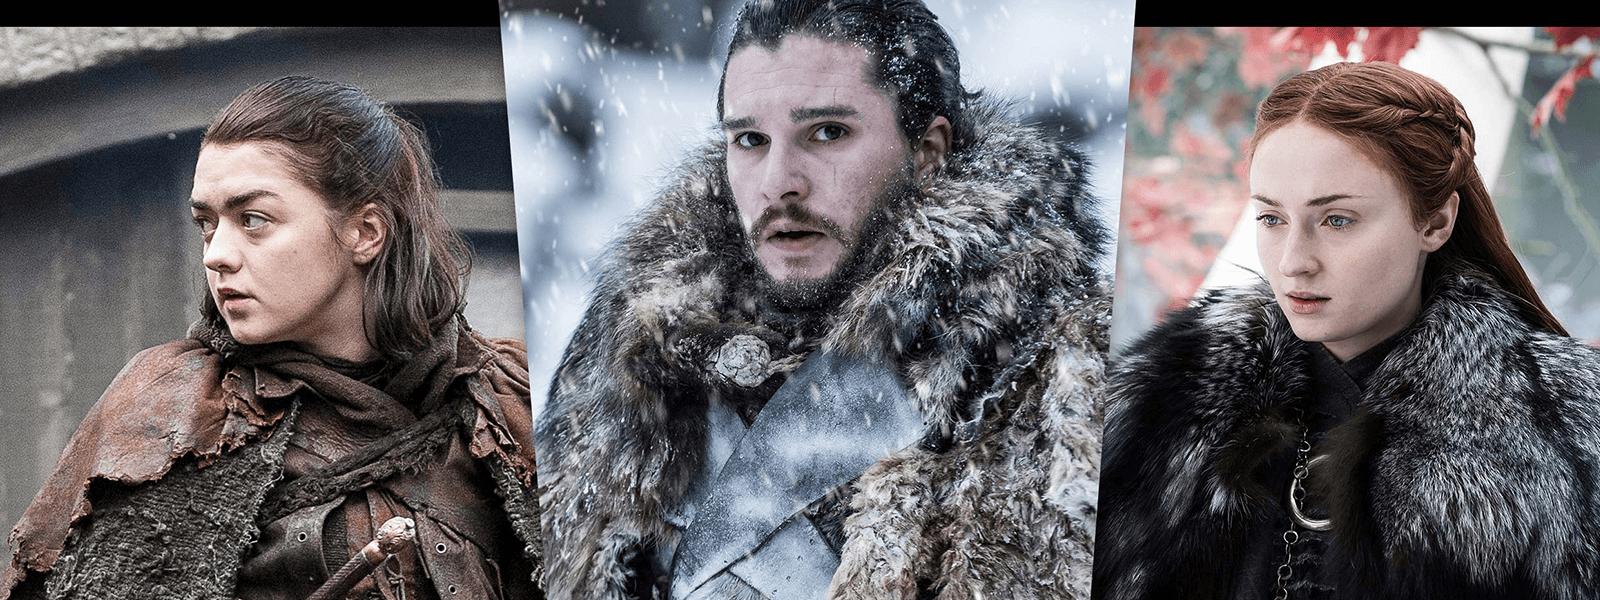 Igra prestola – uskoro poslednja sezona!